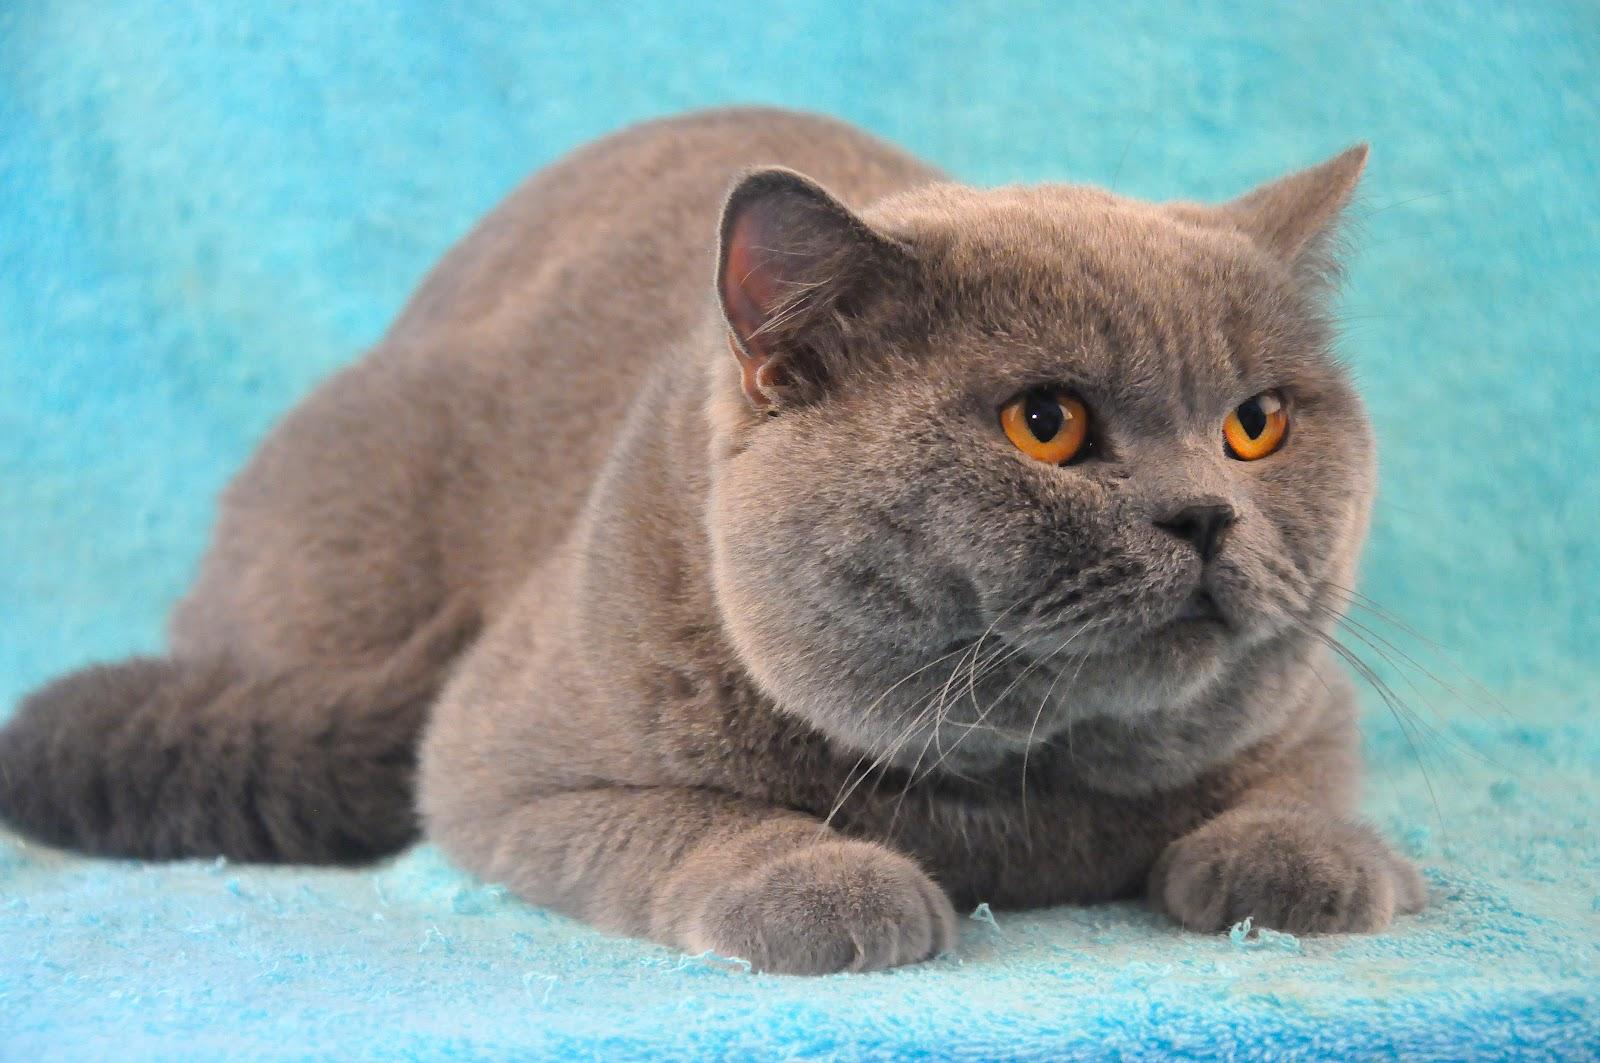 Gambar Kucing Himalaya godean.web.id